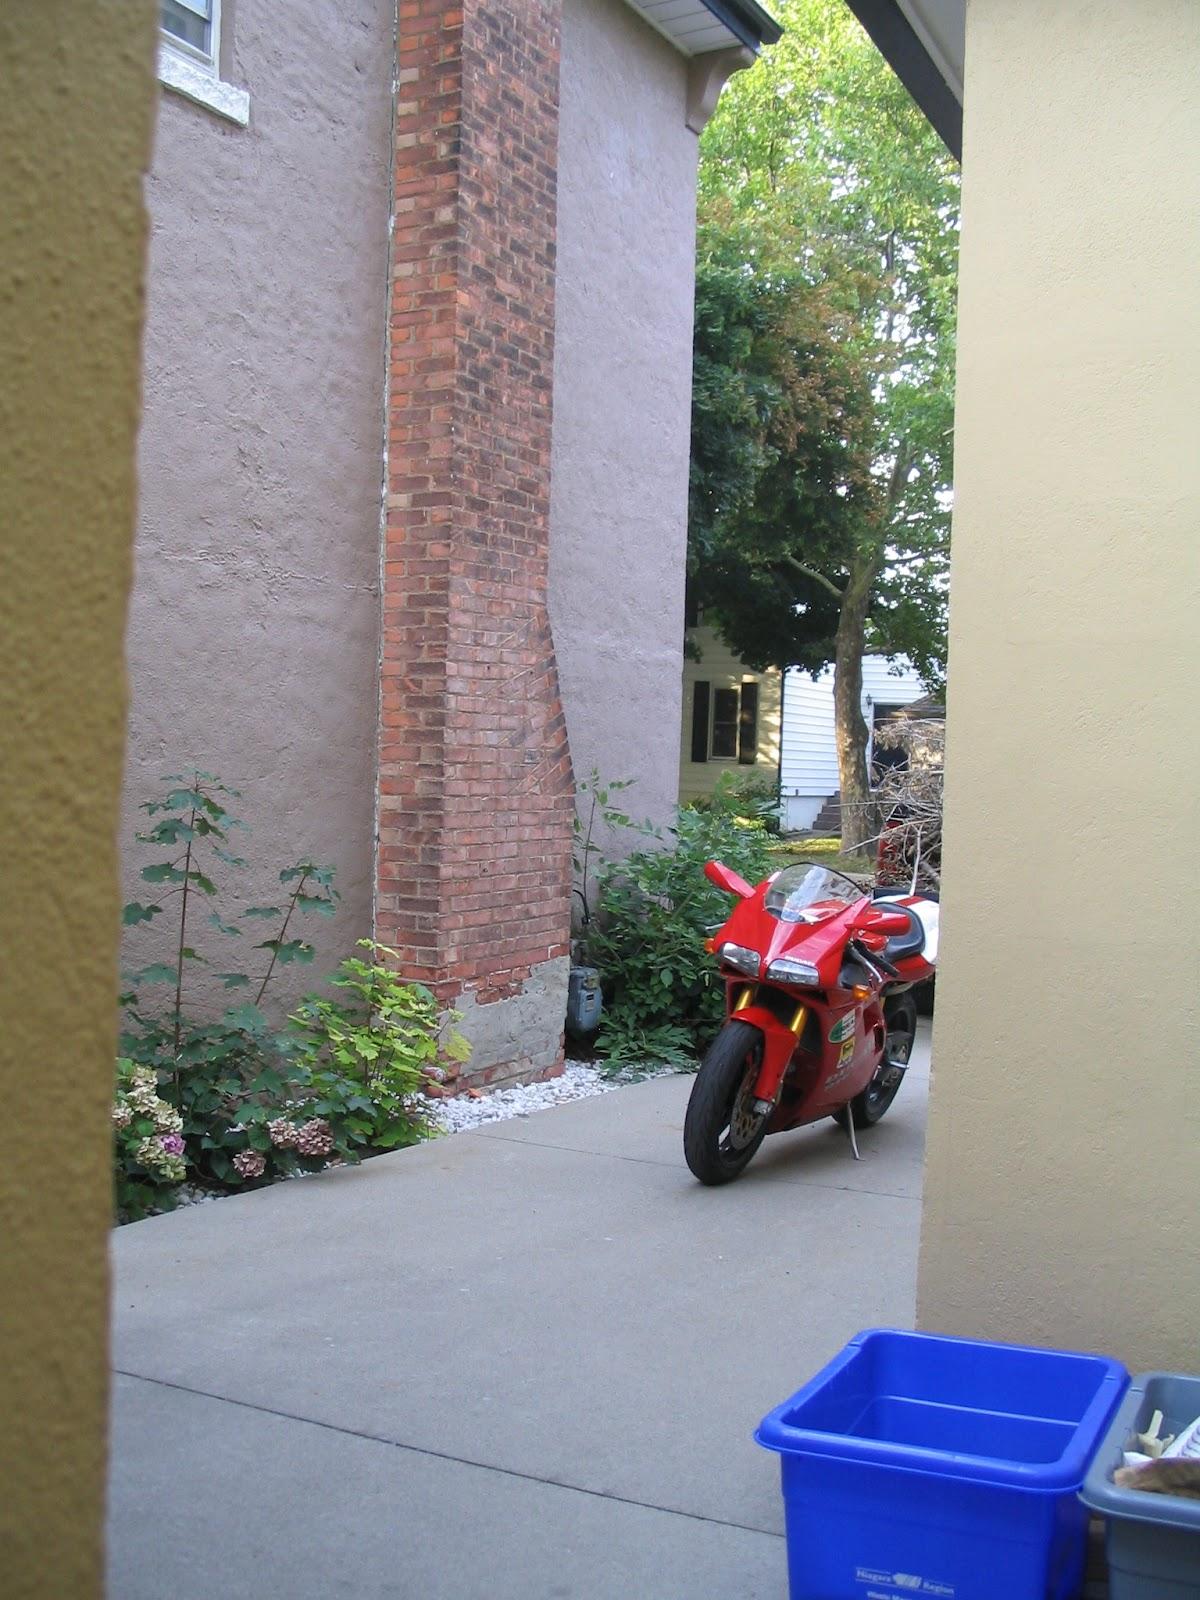 Ducati 916 Driveway